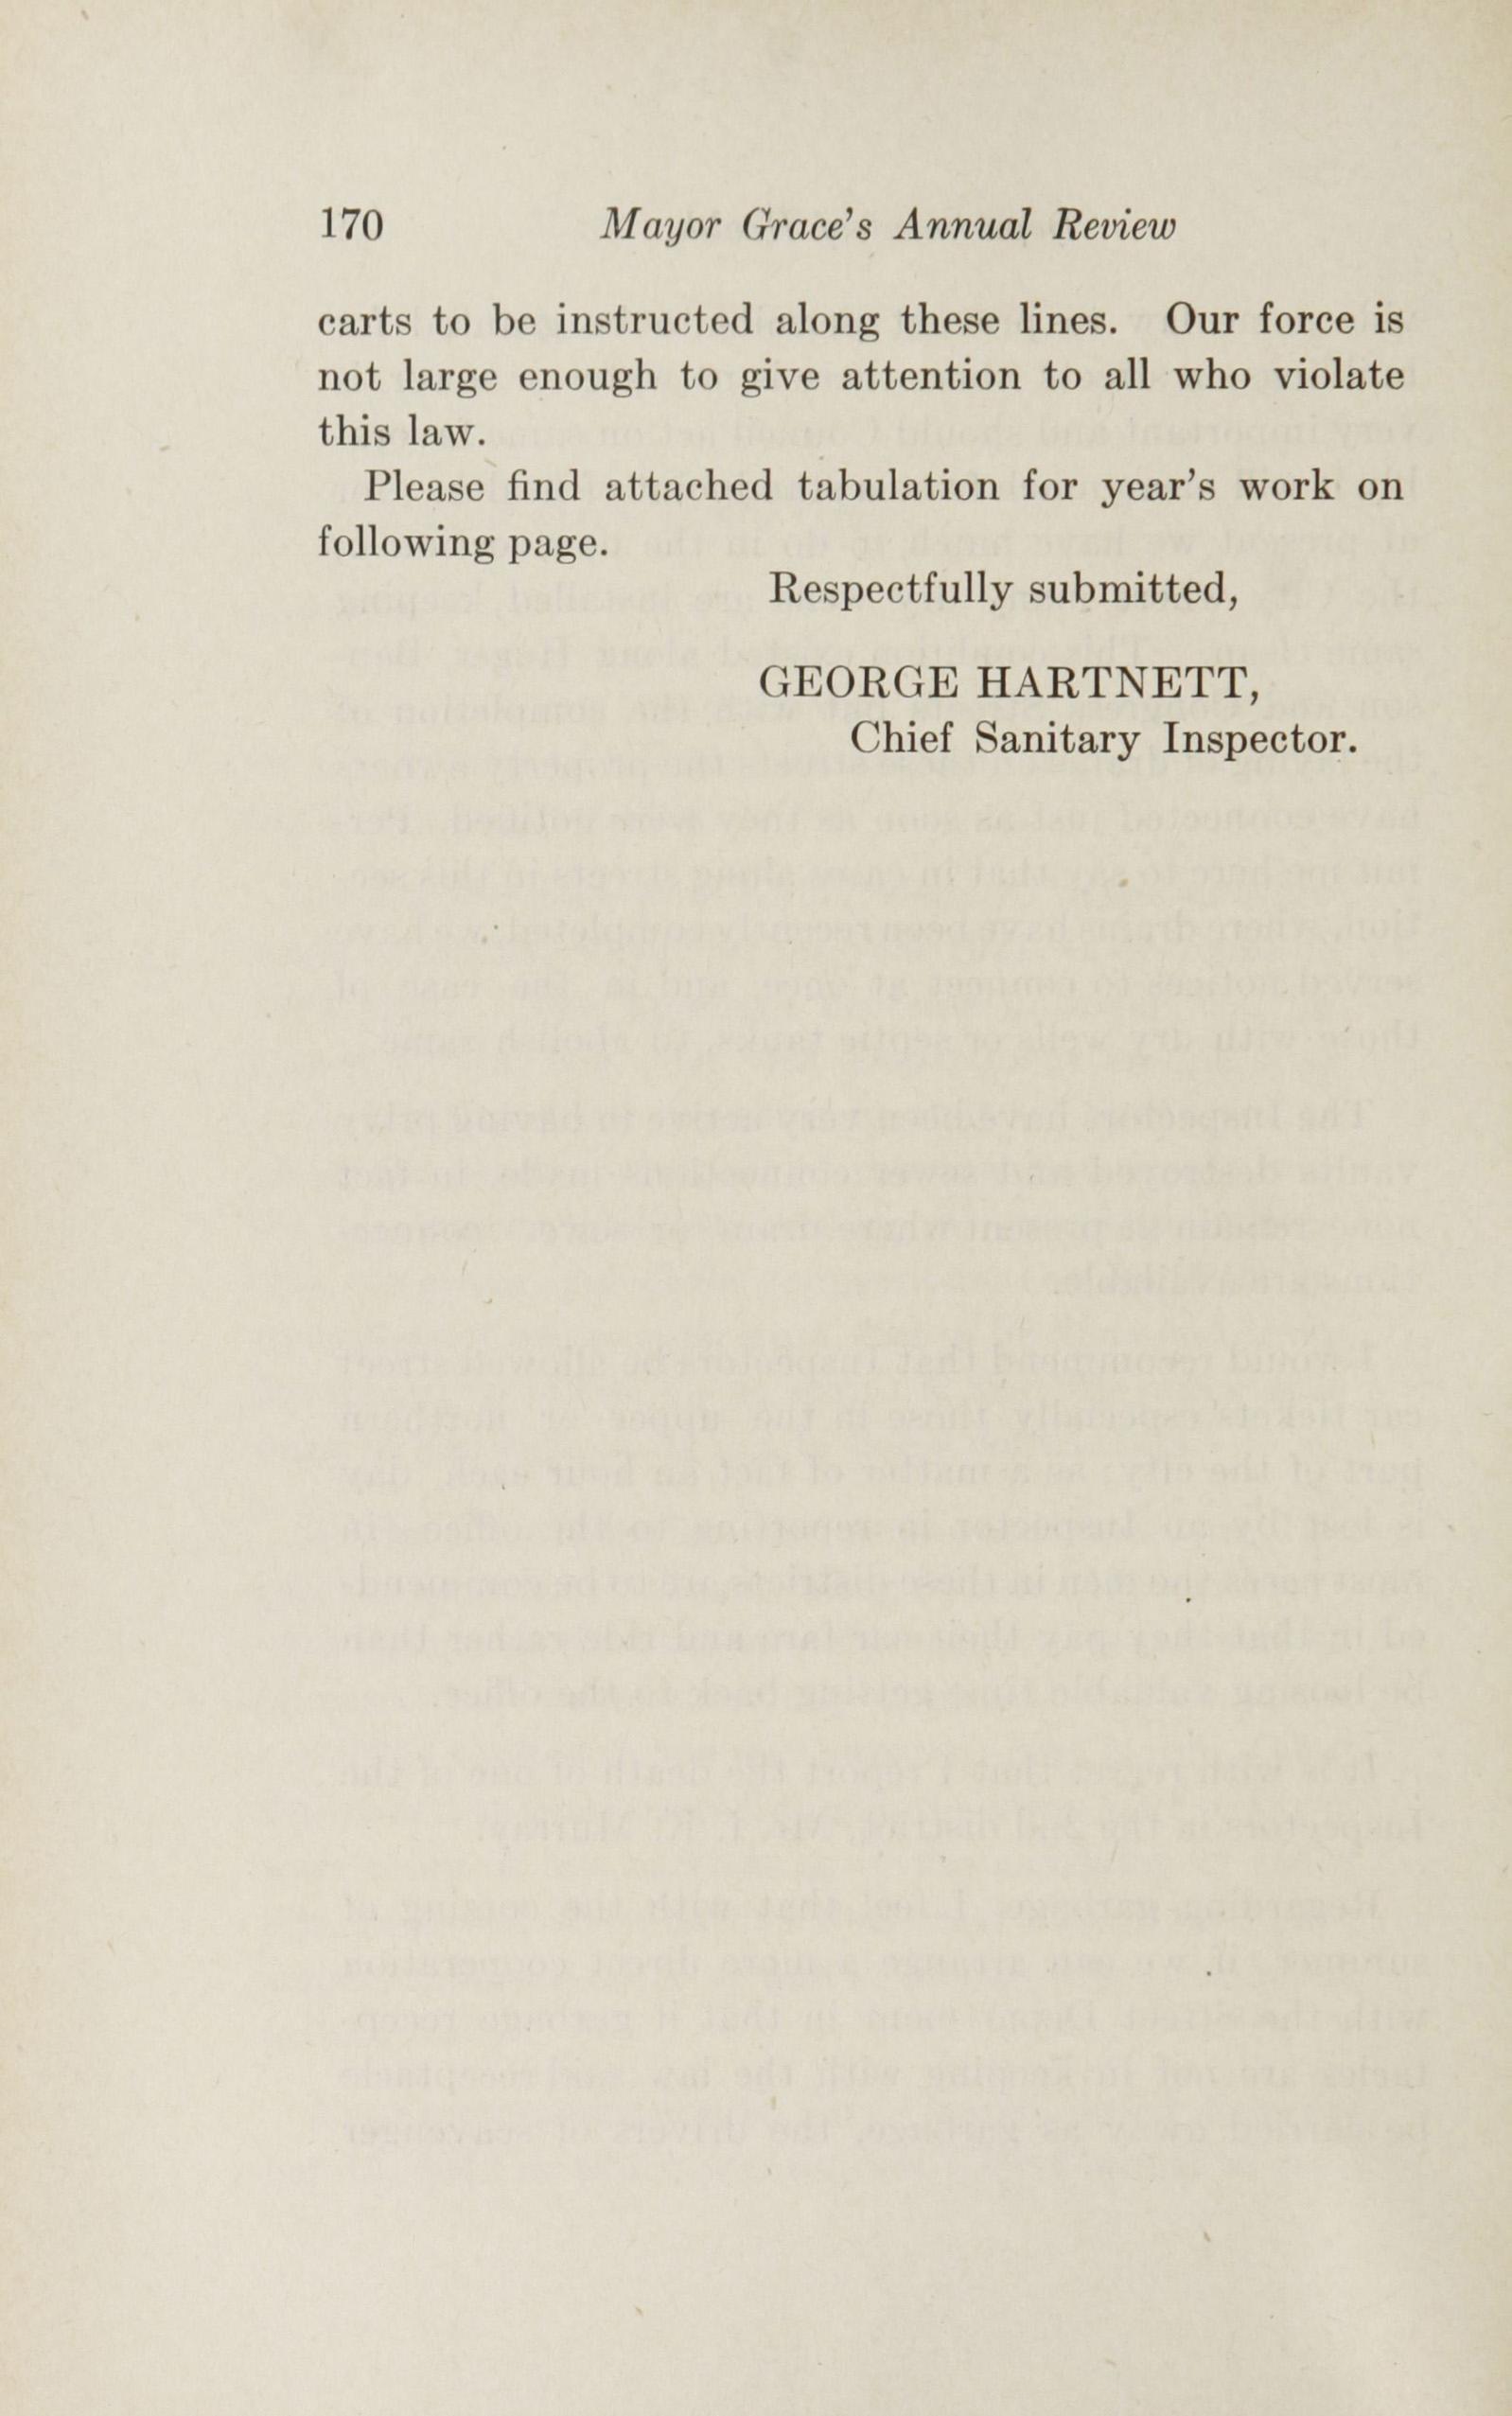 Charleston Yearbook, 1922, page 170